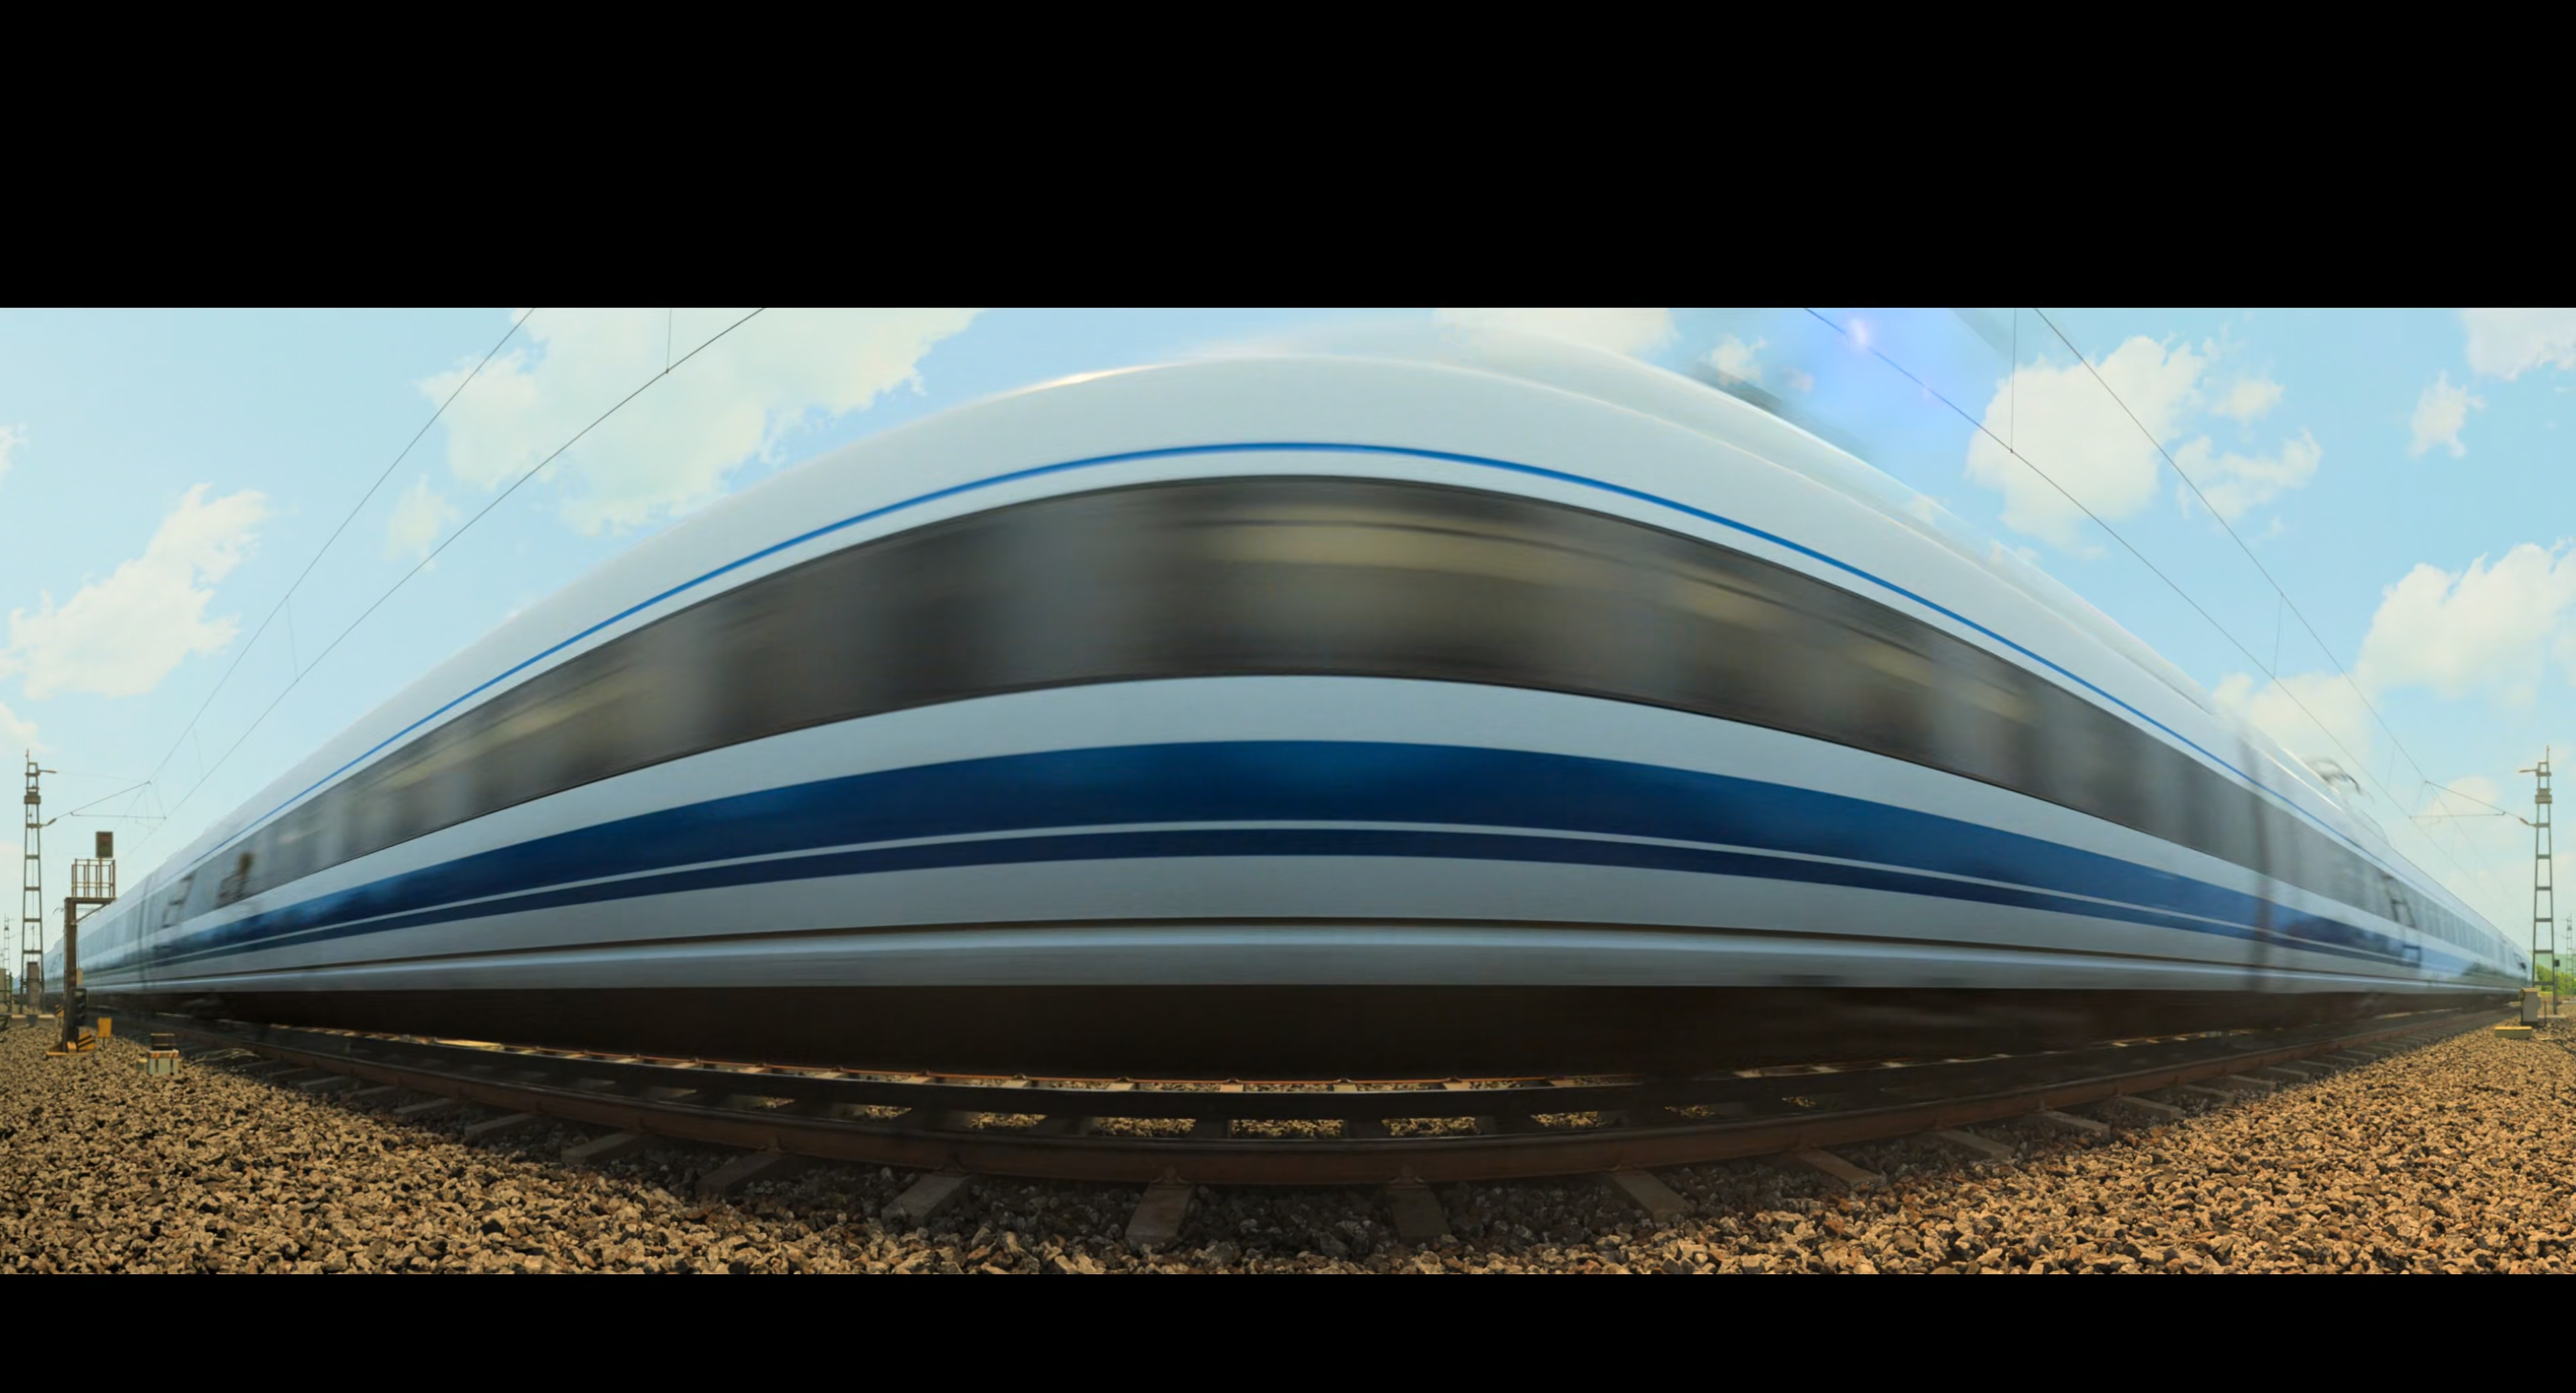 Screenshot où un train de type TGV passe devant la caméra